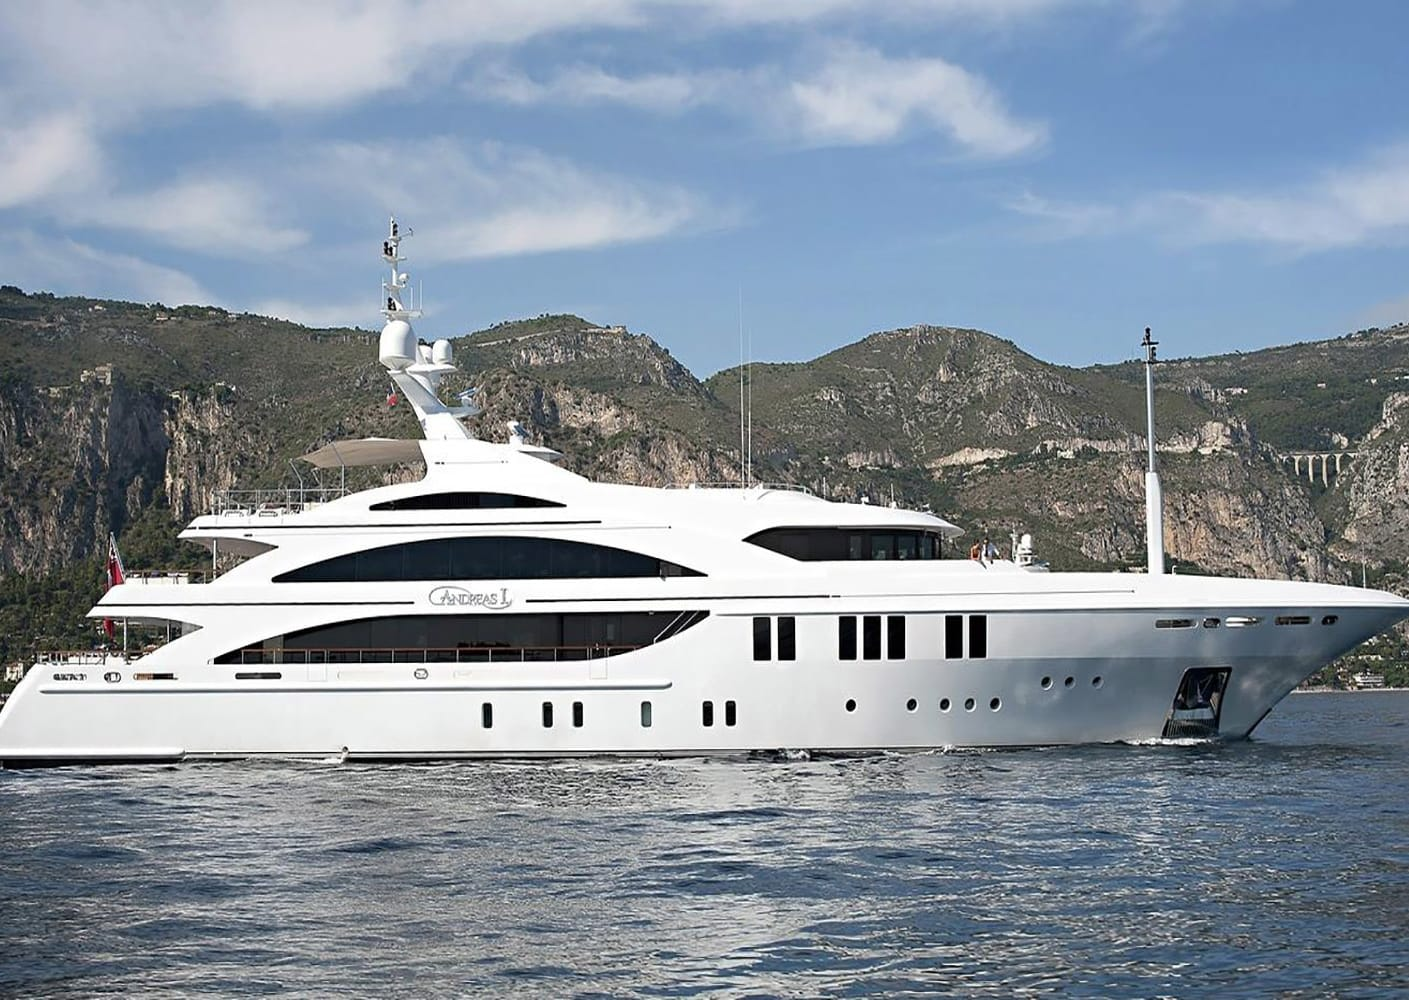 Image of Mimi 60.0M (196.9FT) motor yacht